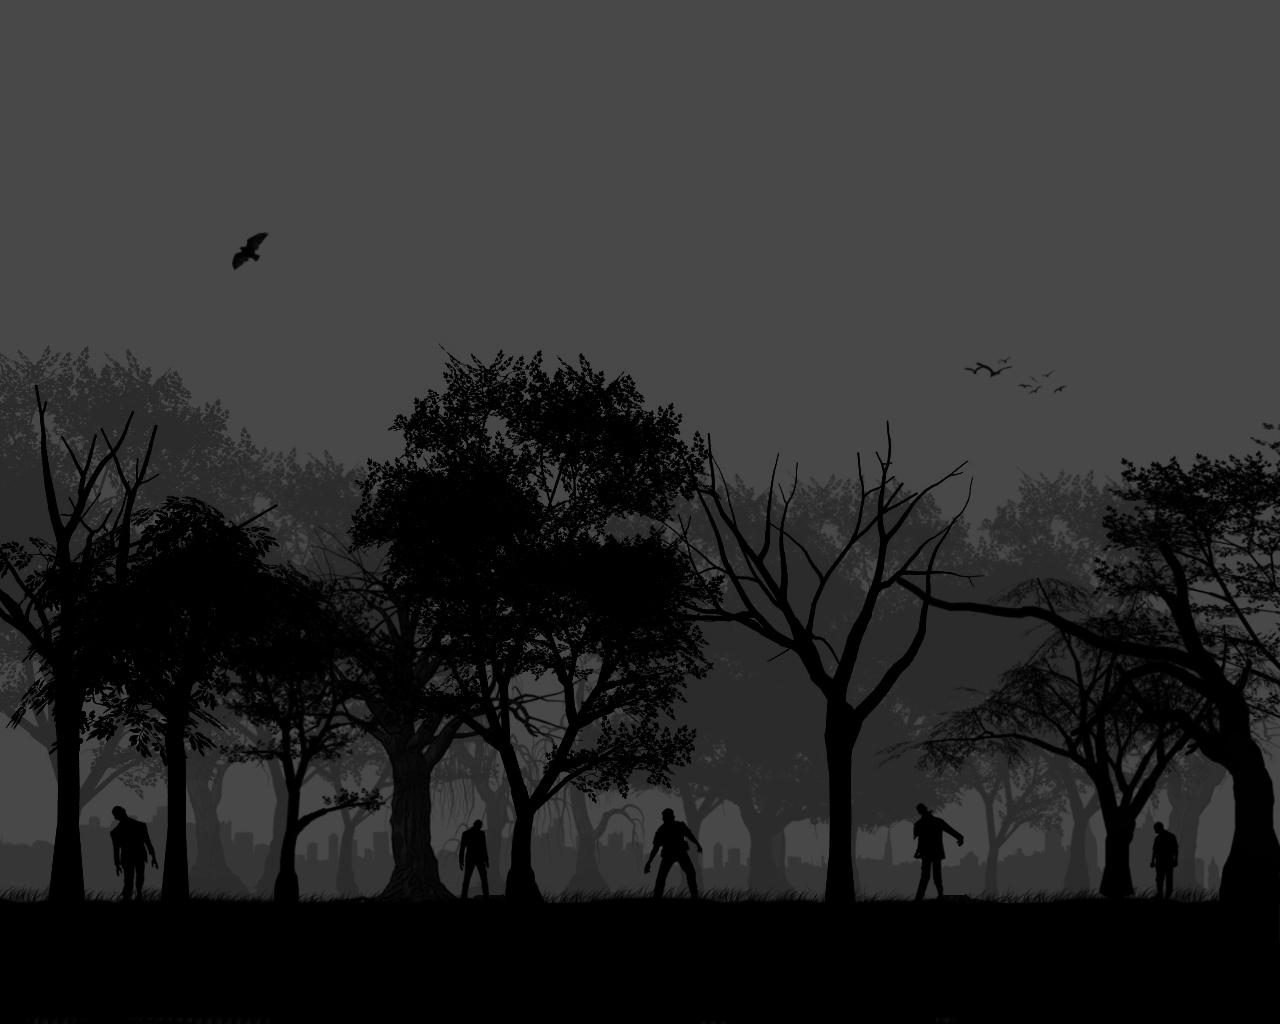 Zombilerin d nyas zombilerin d nyas vol iii kaos for Where can i get wallpaper